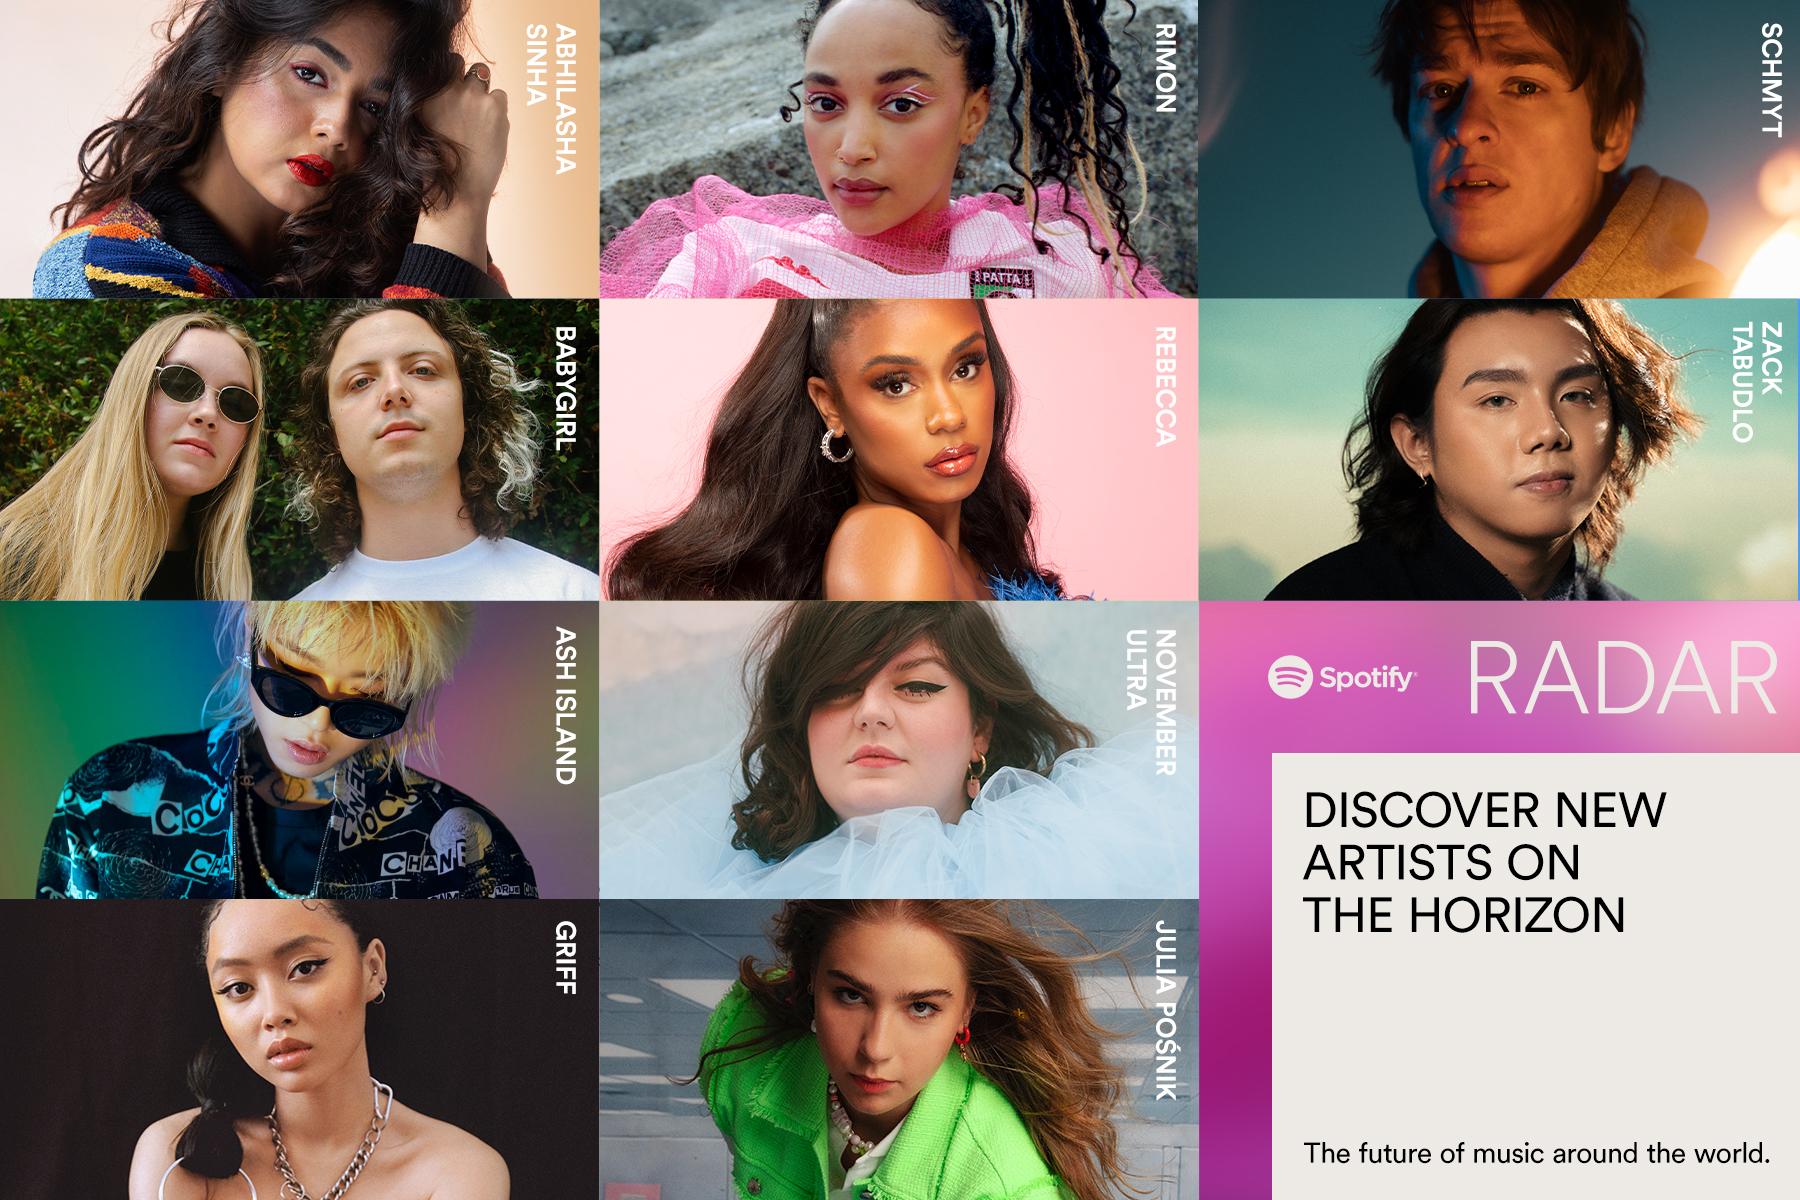 International Music Gets Spotlight By Spotify's Radar Program - Rolling Stone